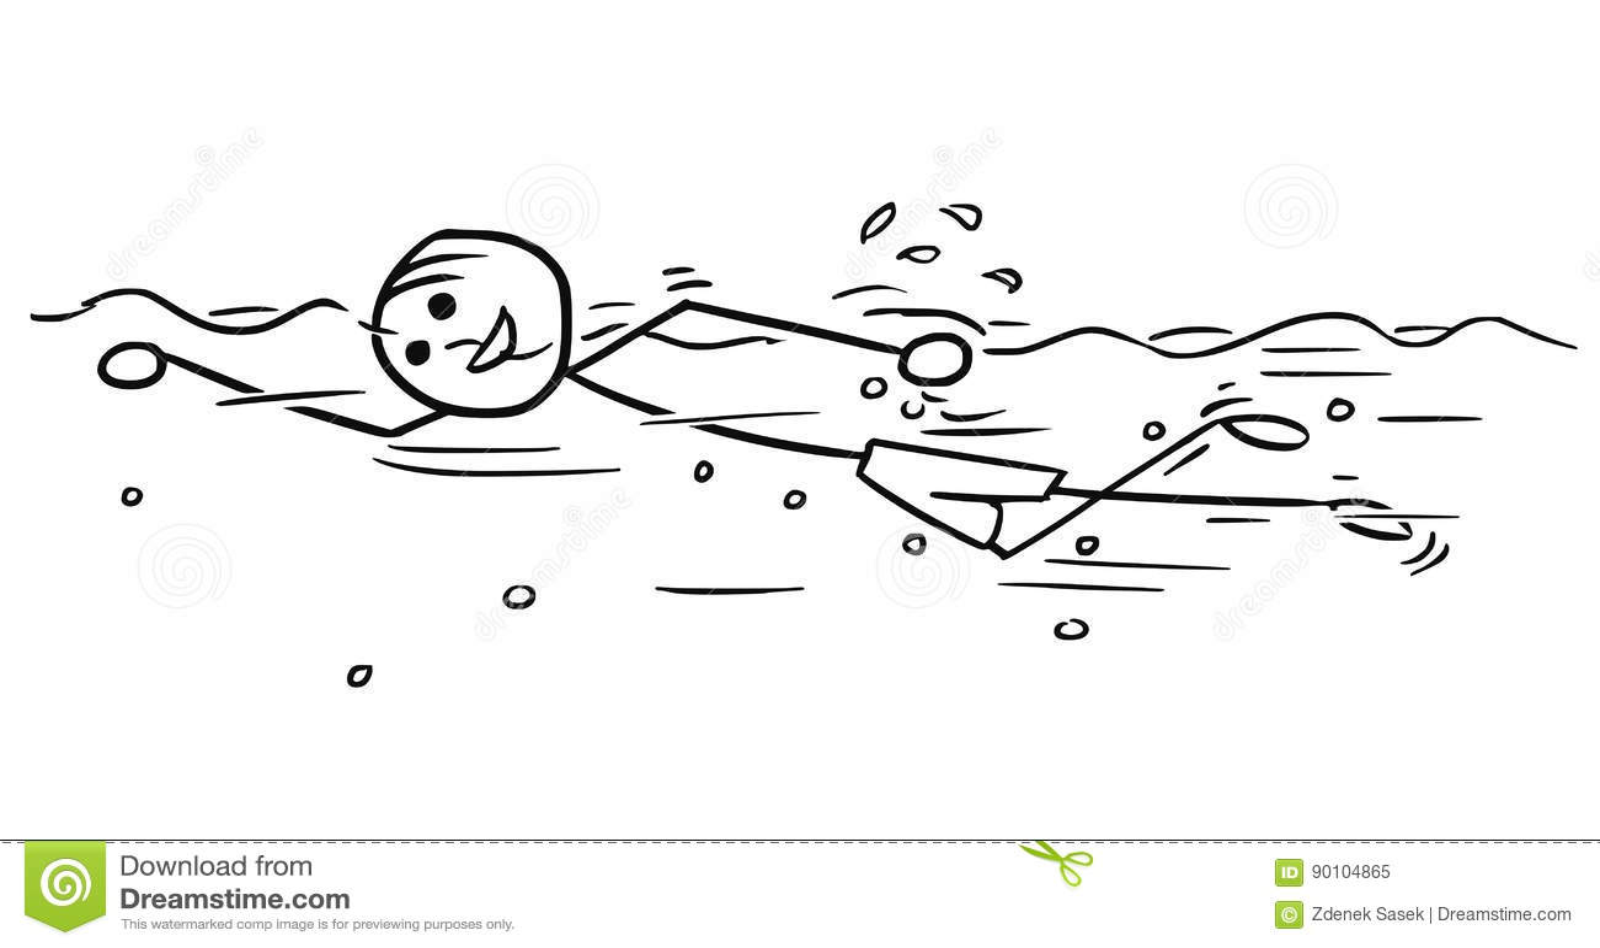 Crawl Cartoons Illustrations Amp Vector Stock Images